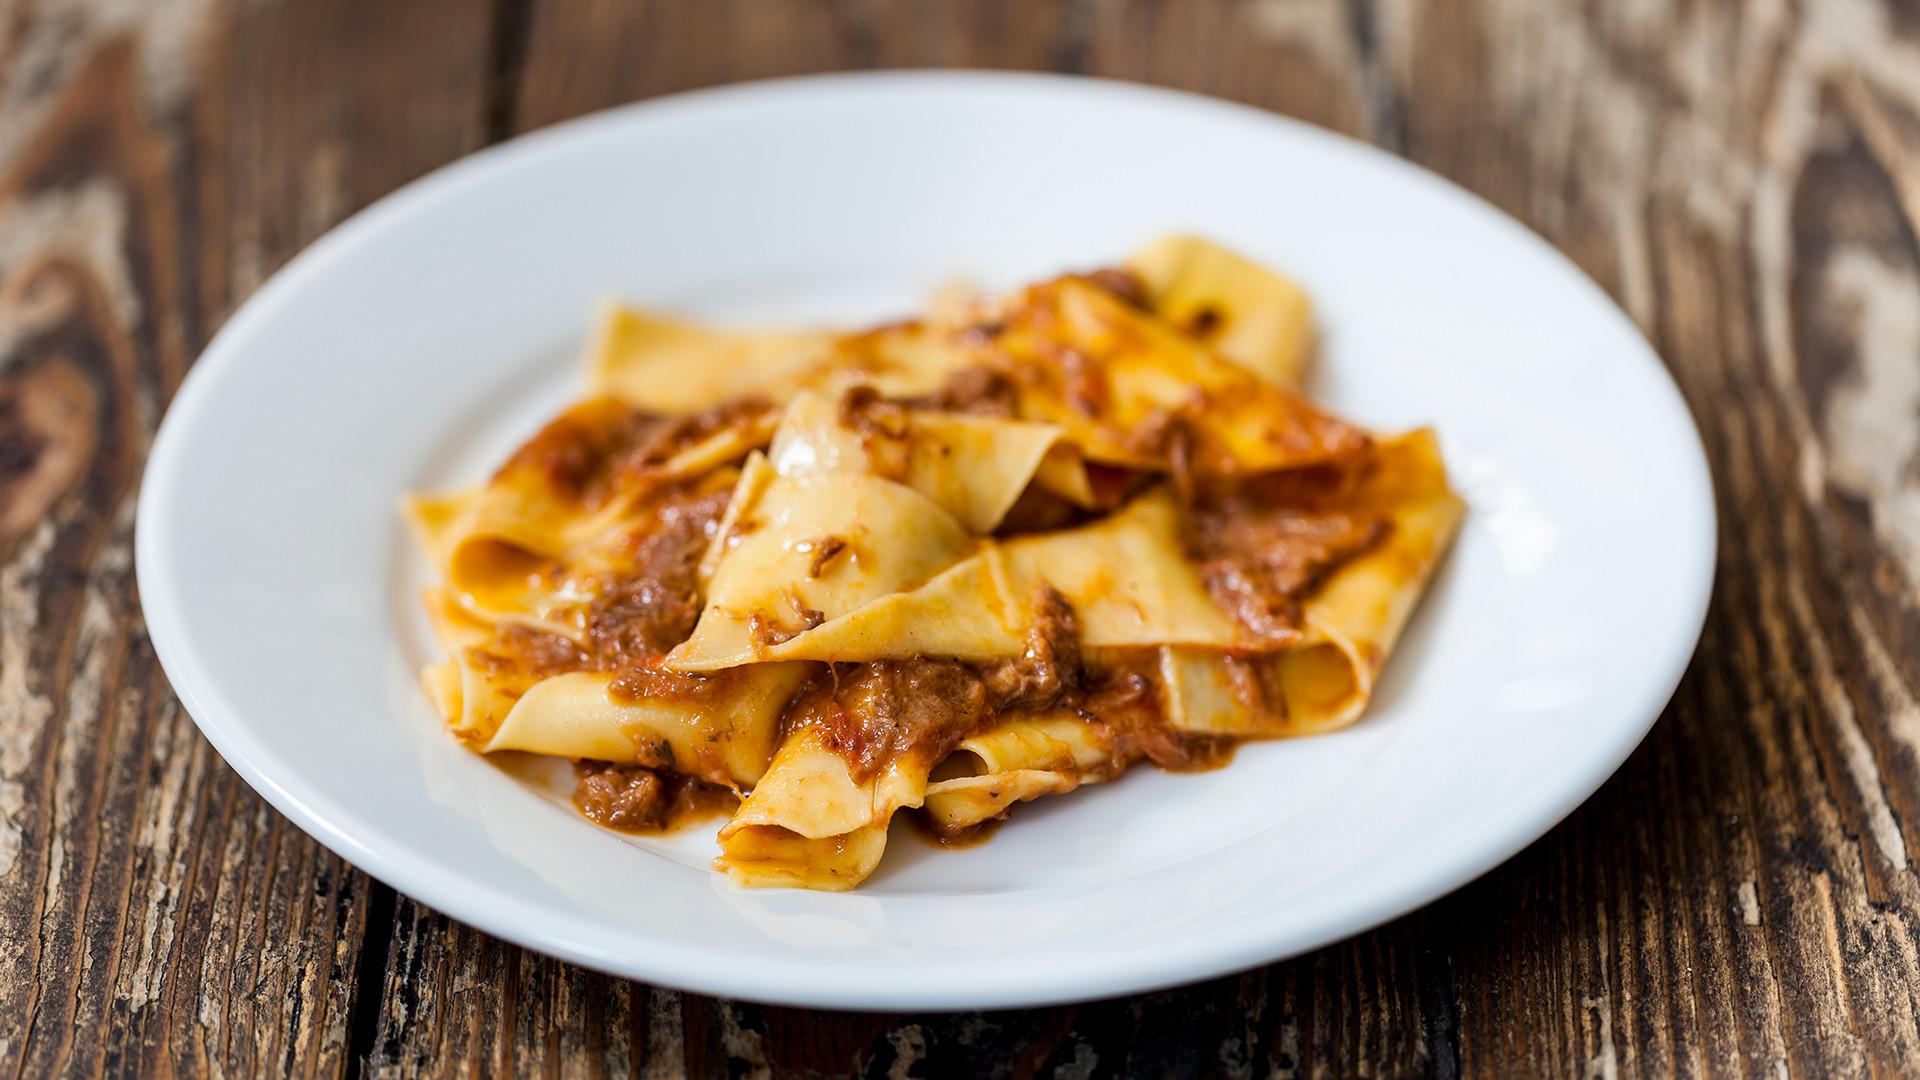 Best pasta restaurants in London – Trullo